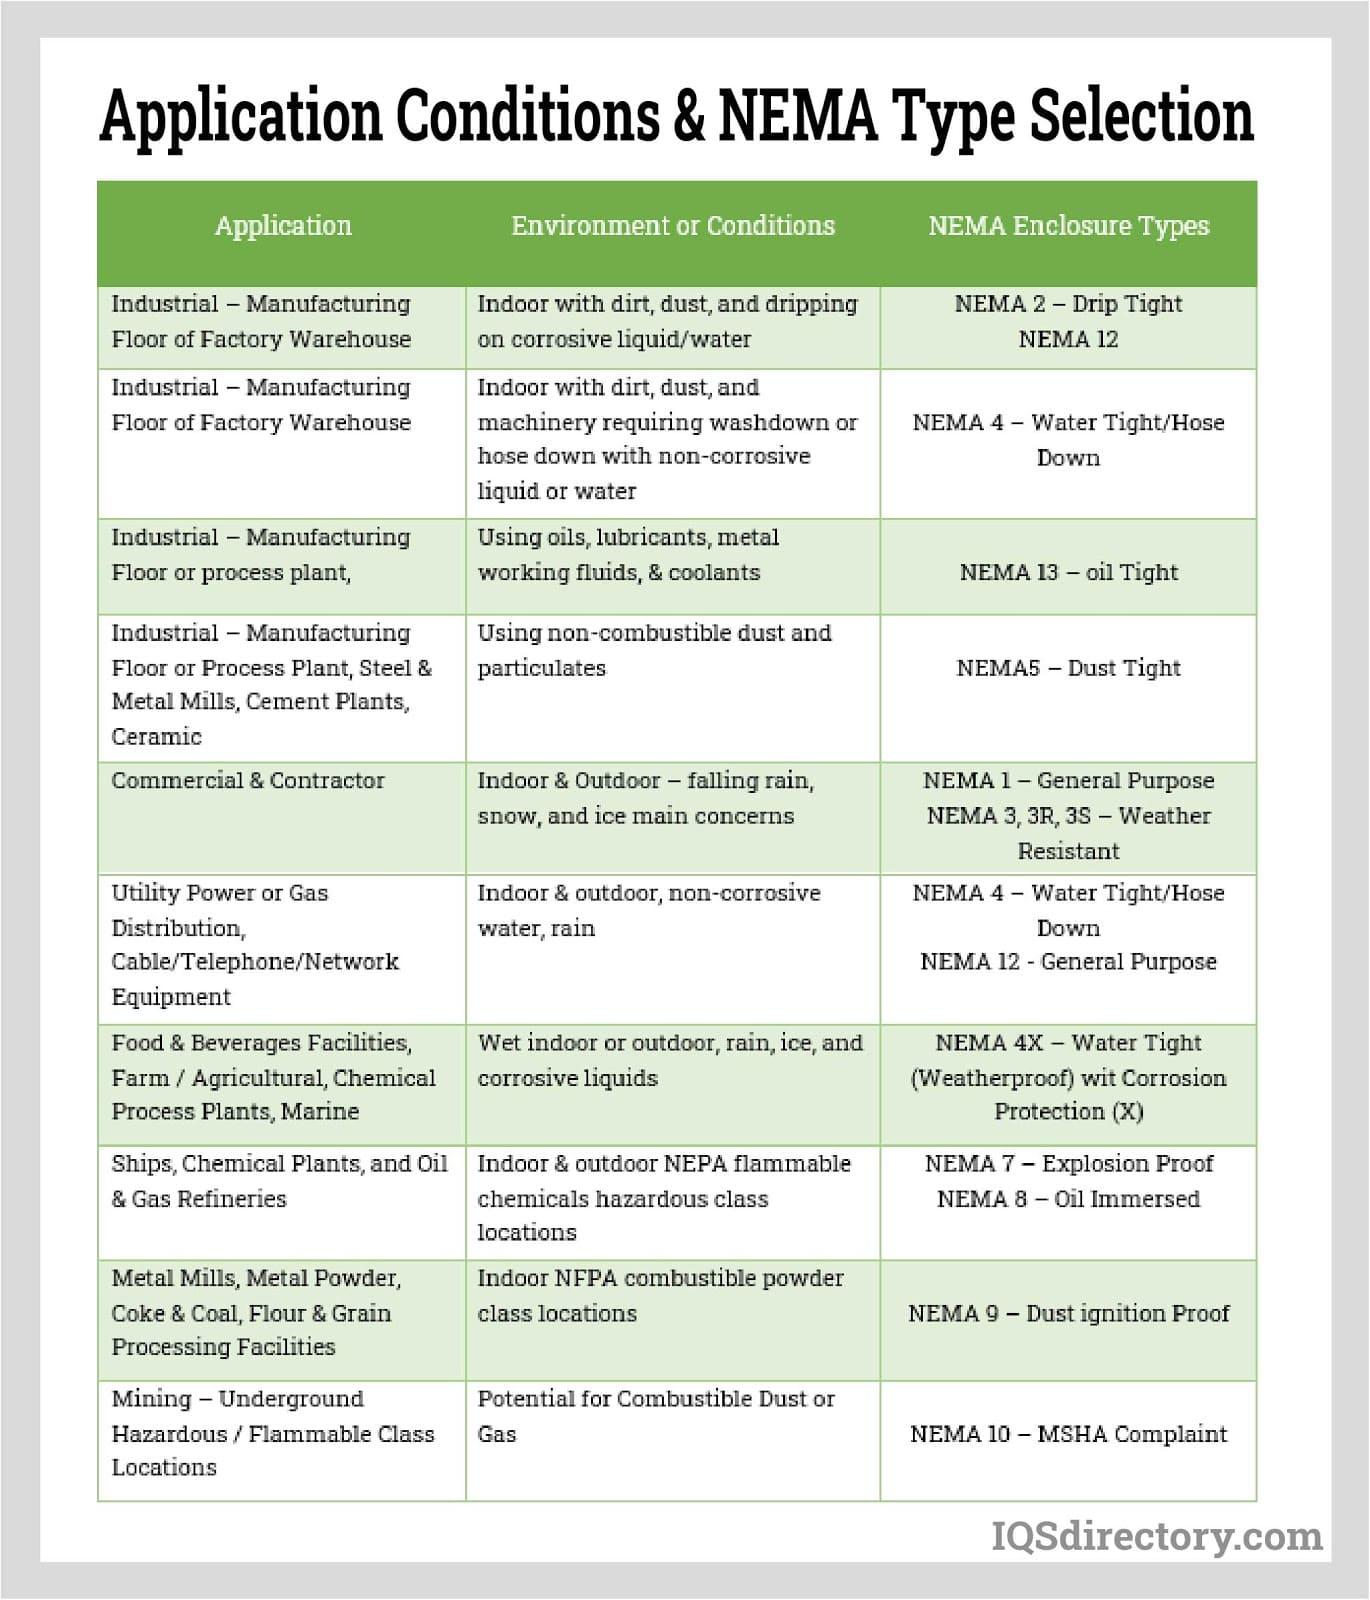 Application Conditions & NEMA Type Selection